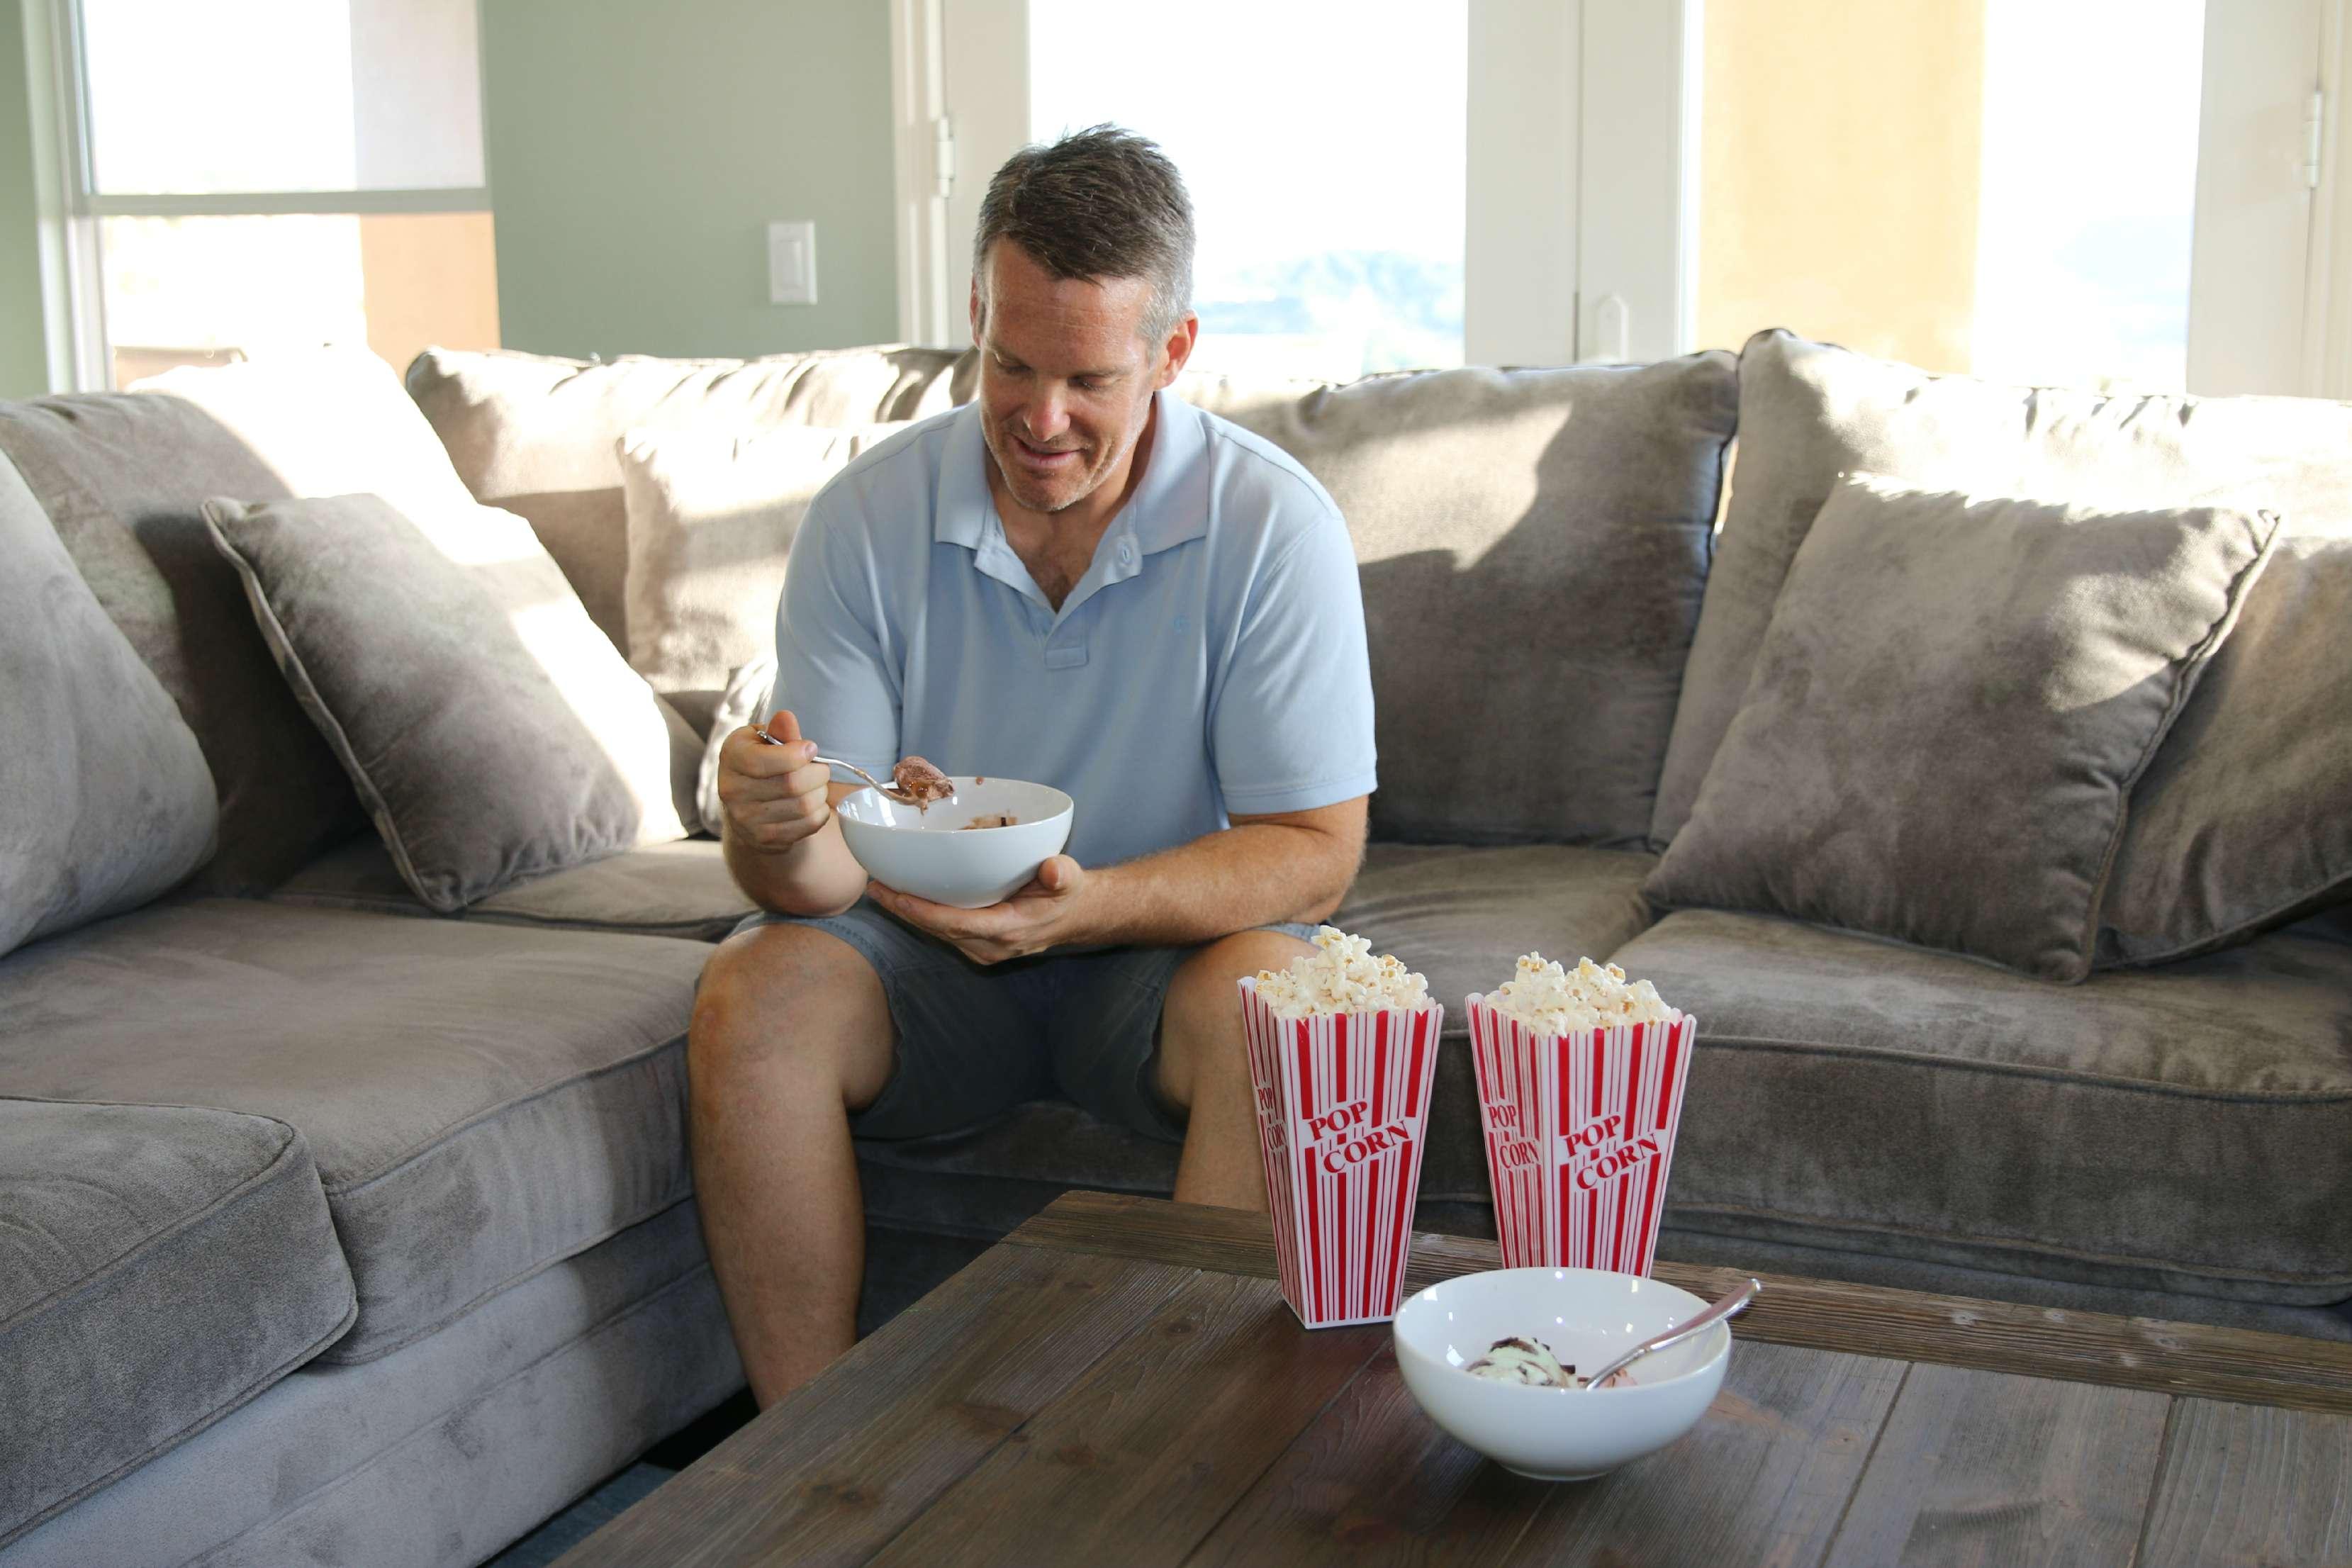 popcorn and gelato